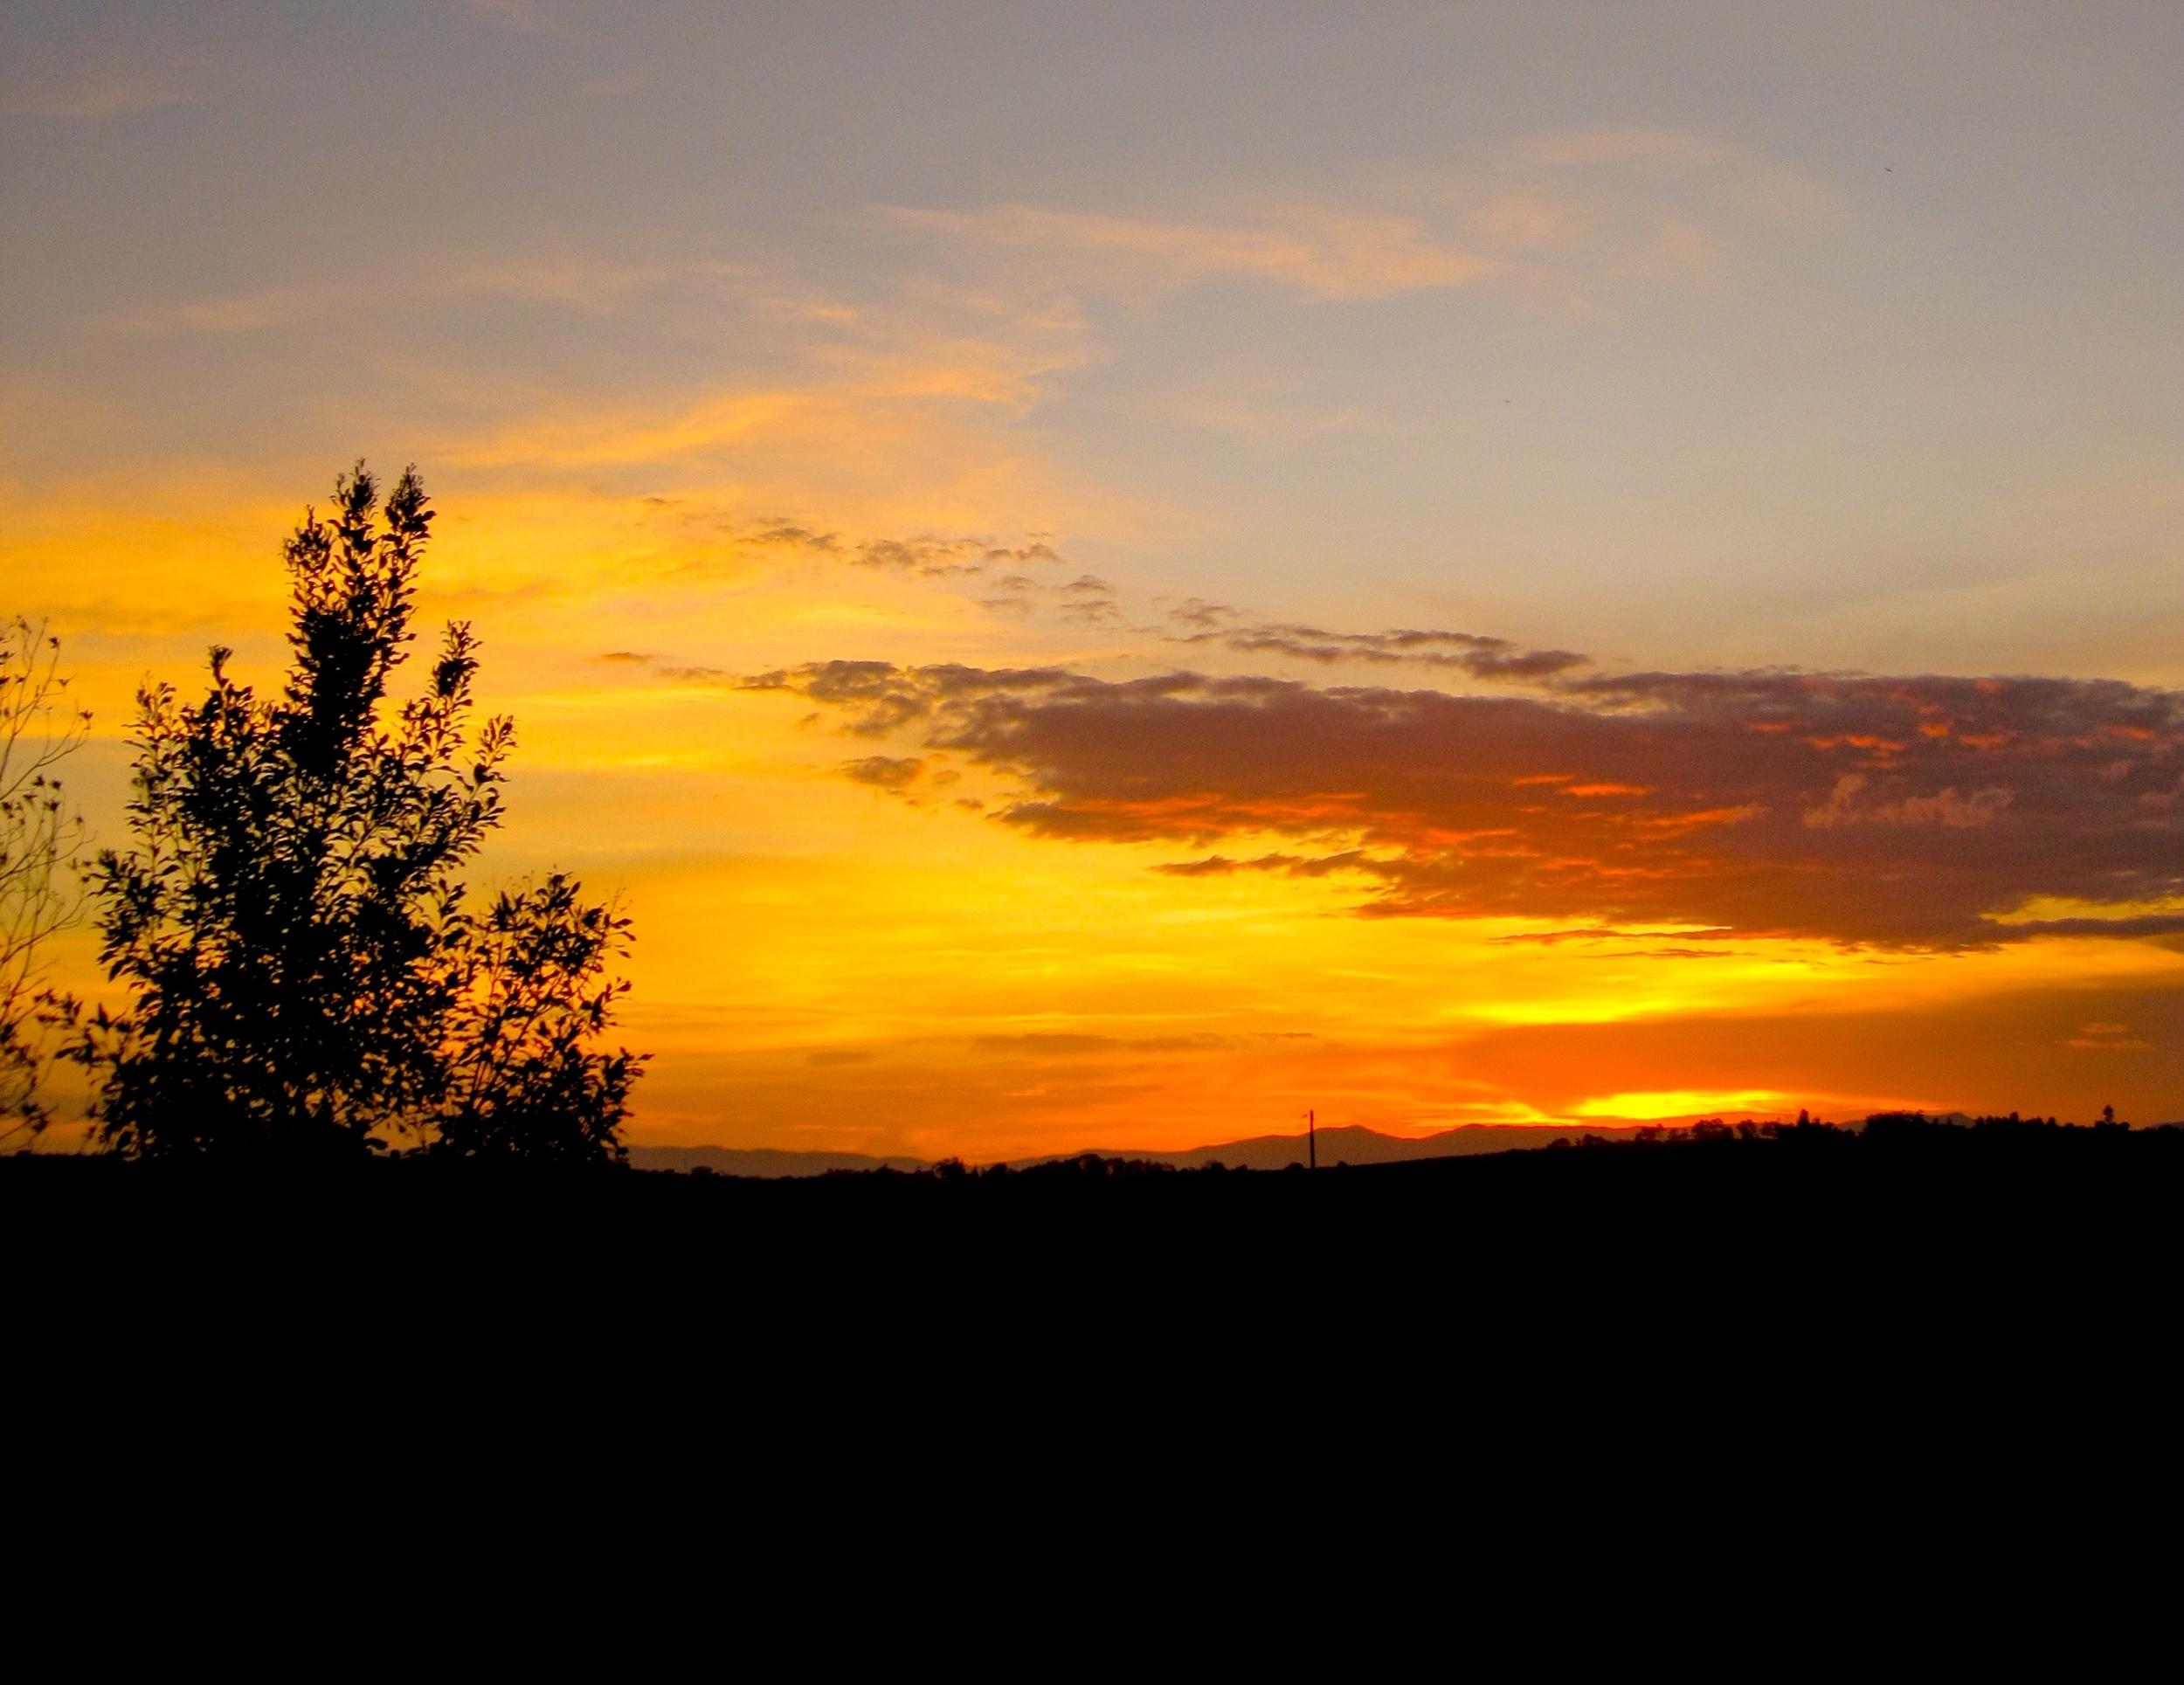 Atherton Tablelands at Sunset